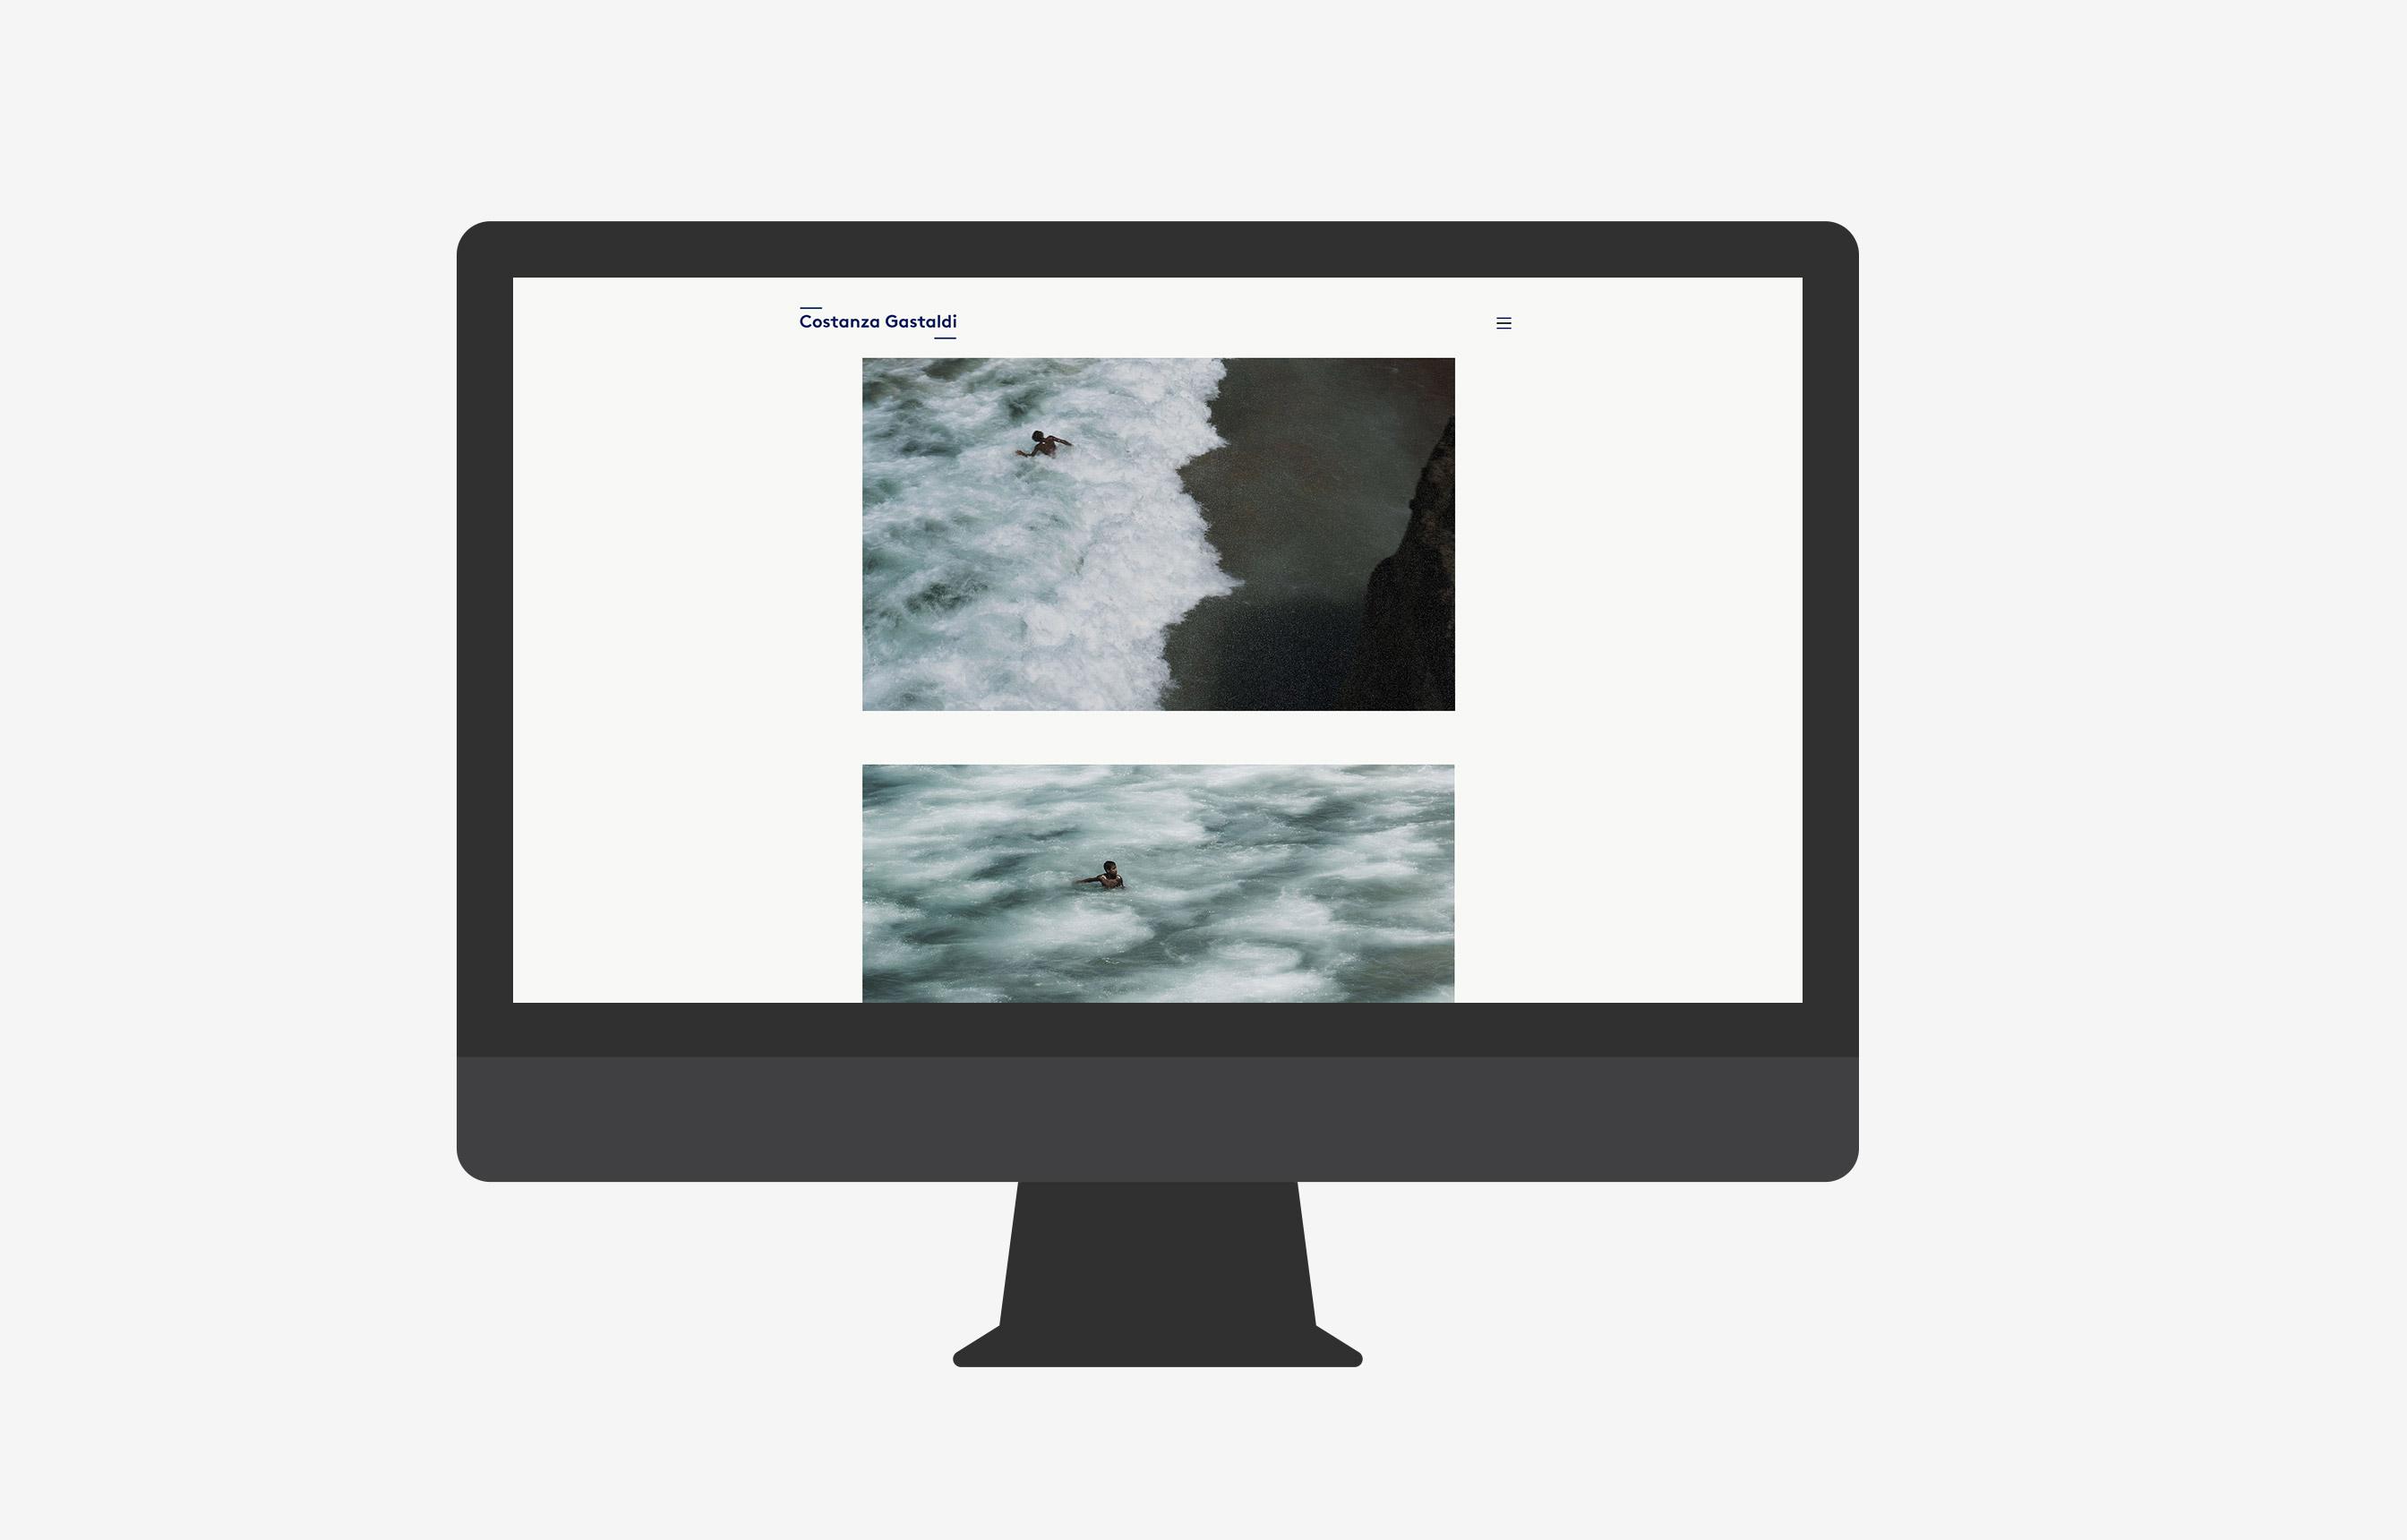 05-costanza-gastaldi-pikteo-webdesign-graphic-design-freelance-paris-bruxelles-londres